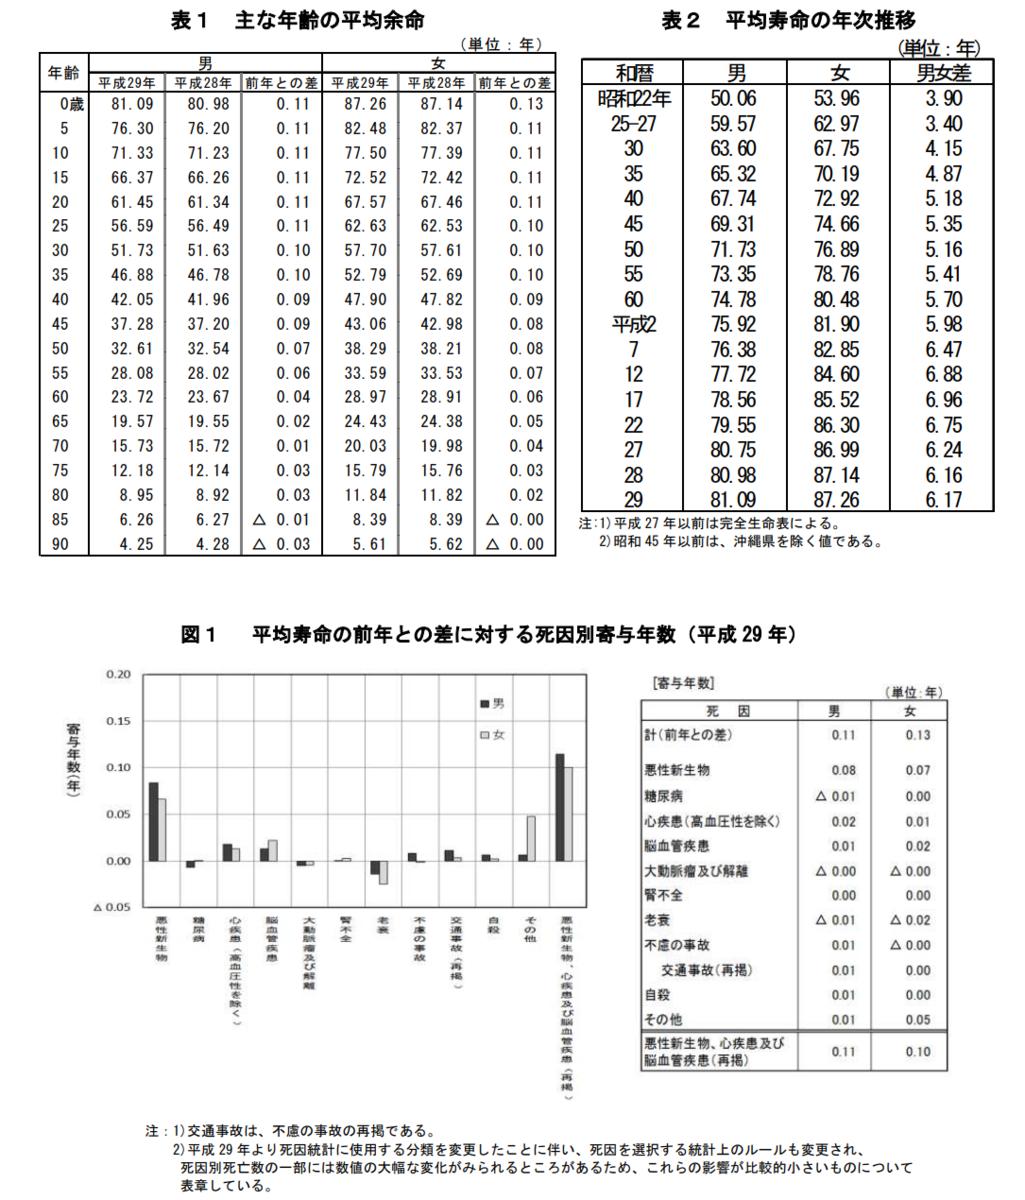 f:id:carrot-lanthanum0812:20190425182529p:plain